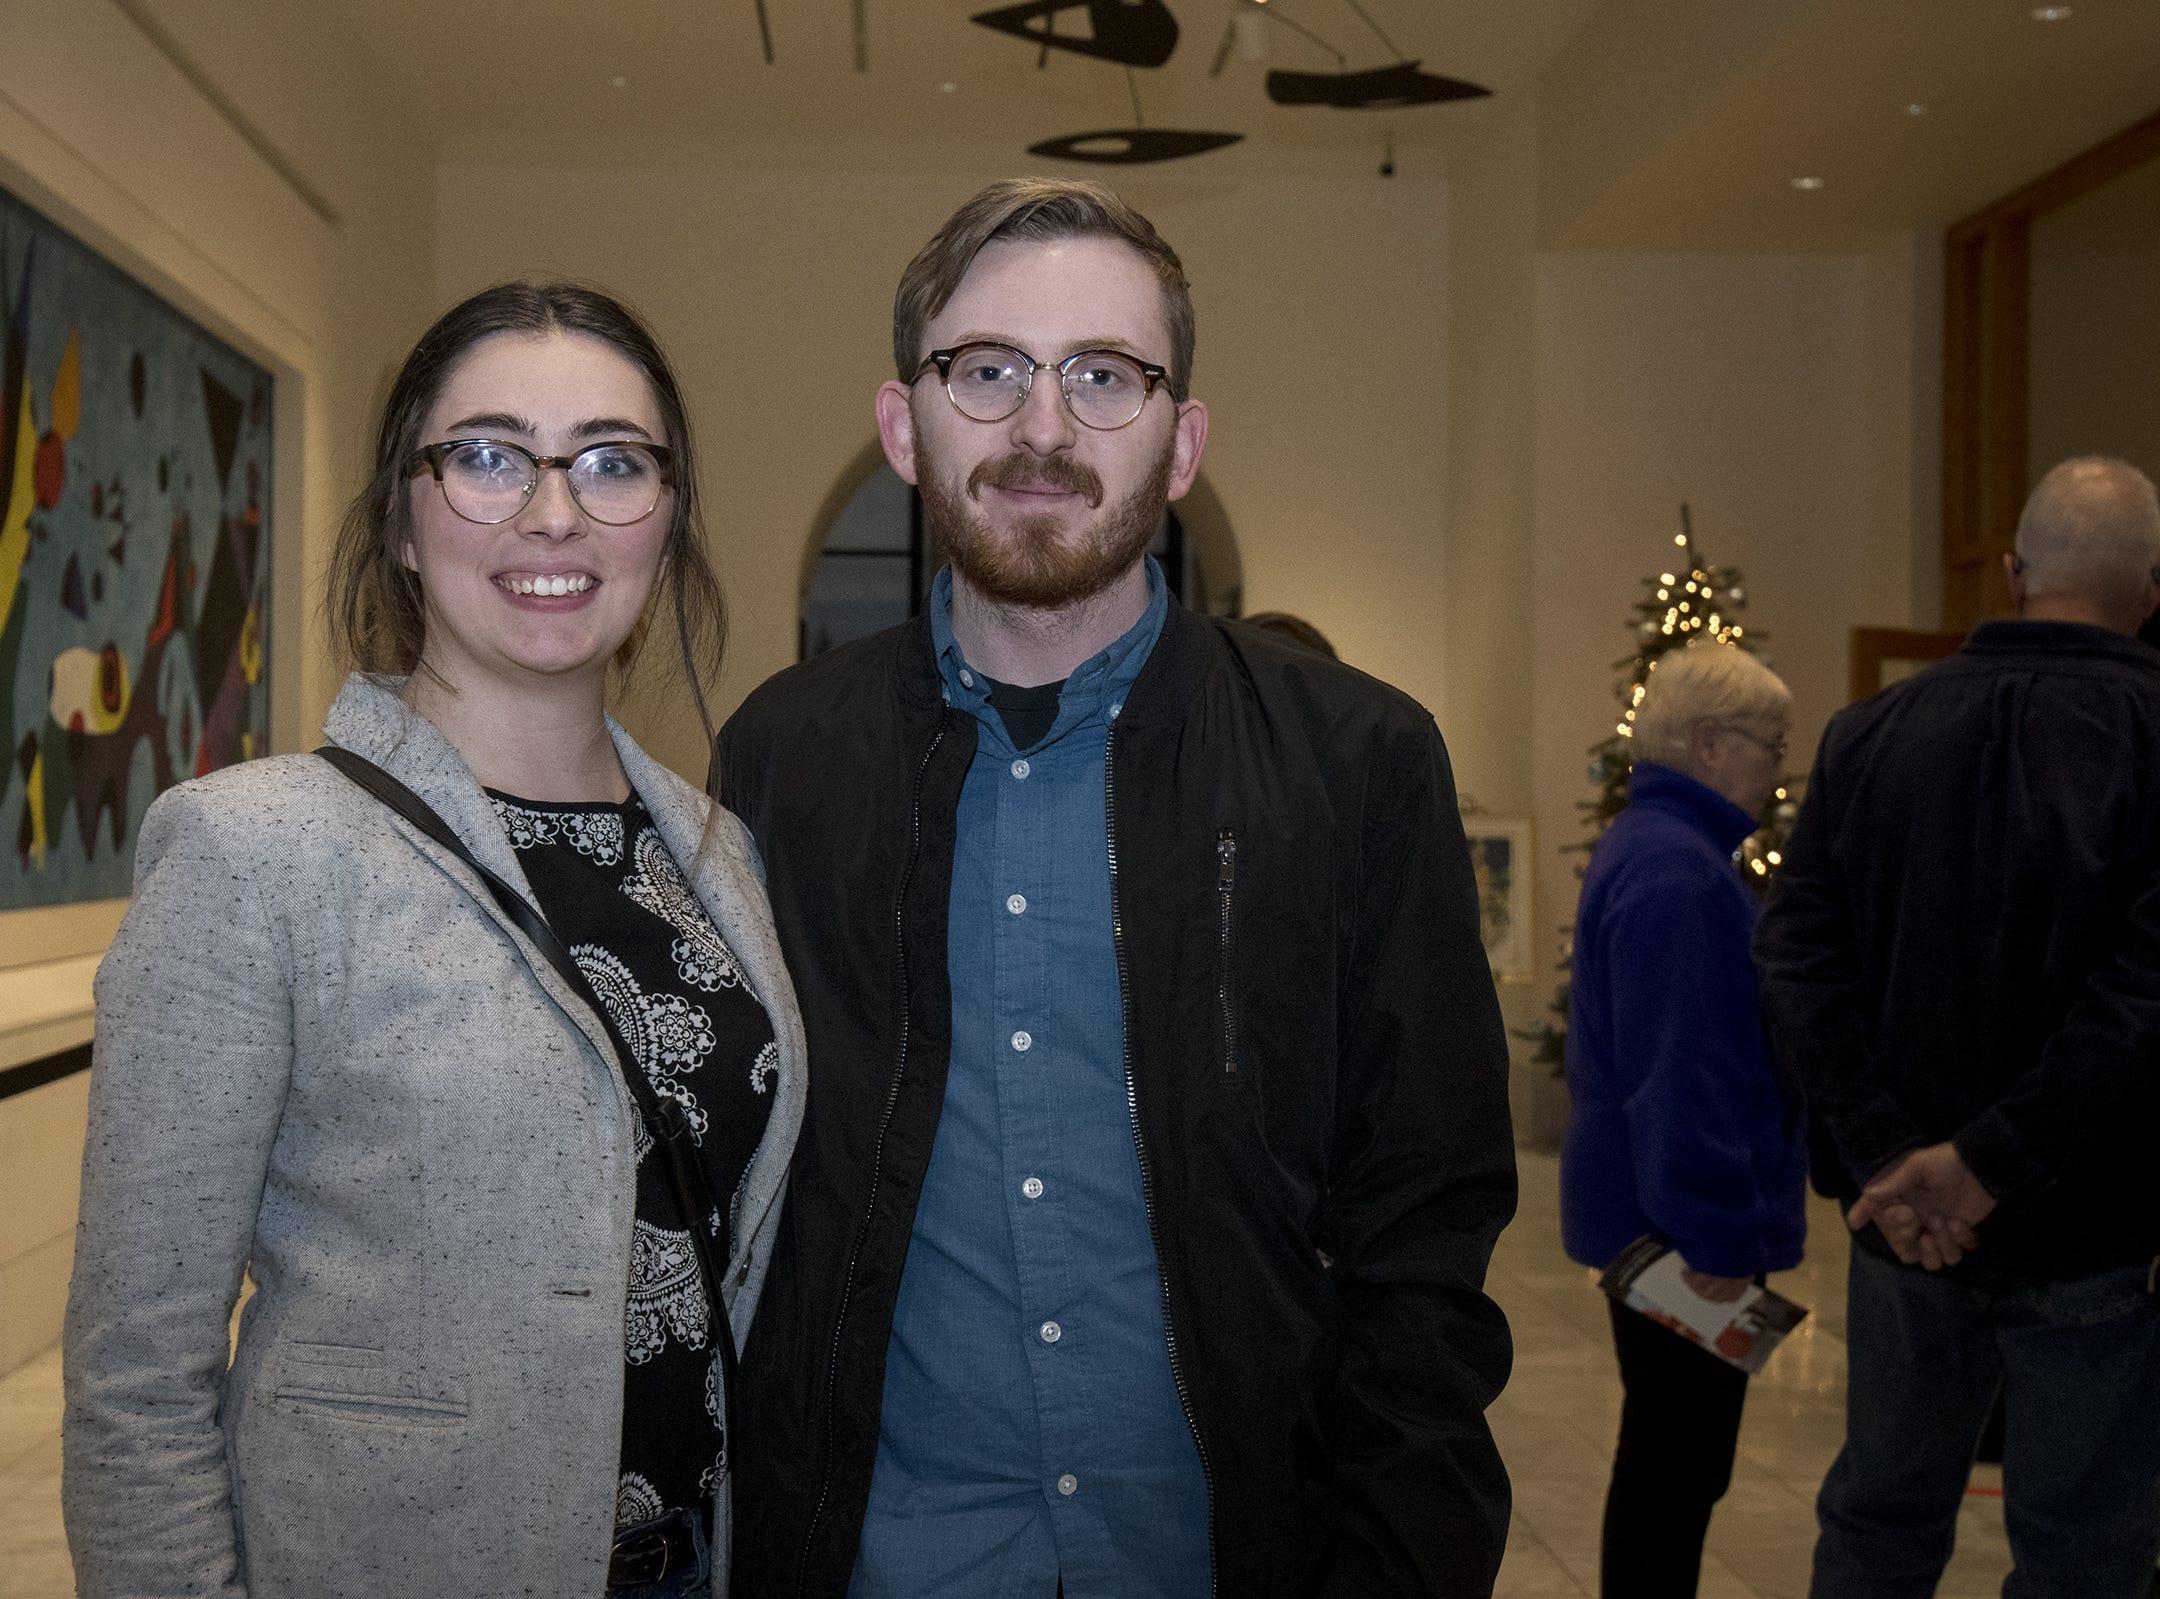 Nicole Braun and Chris Larmouth of Covington attend Art After Dark at the Cincinnati Art Museum Wednesday, November 21, 2018 in Cincinnati, Ohio.